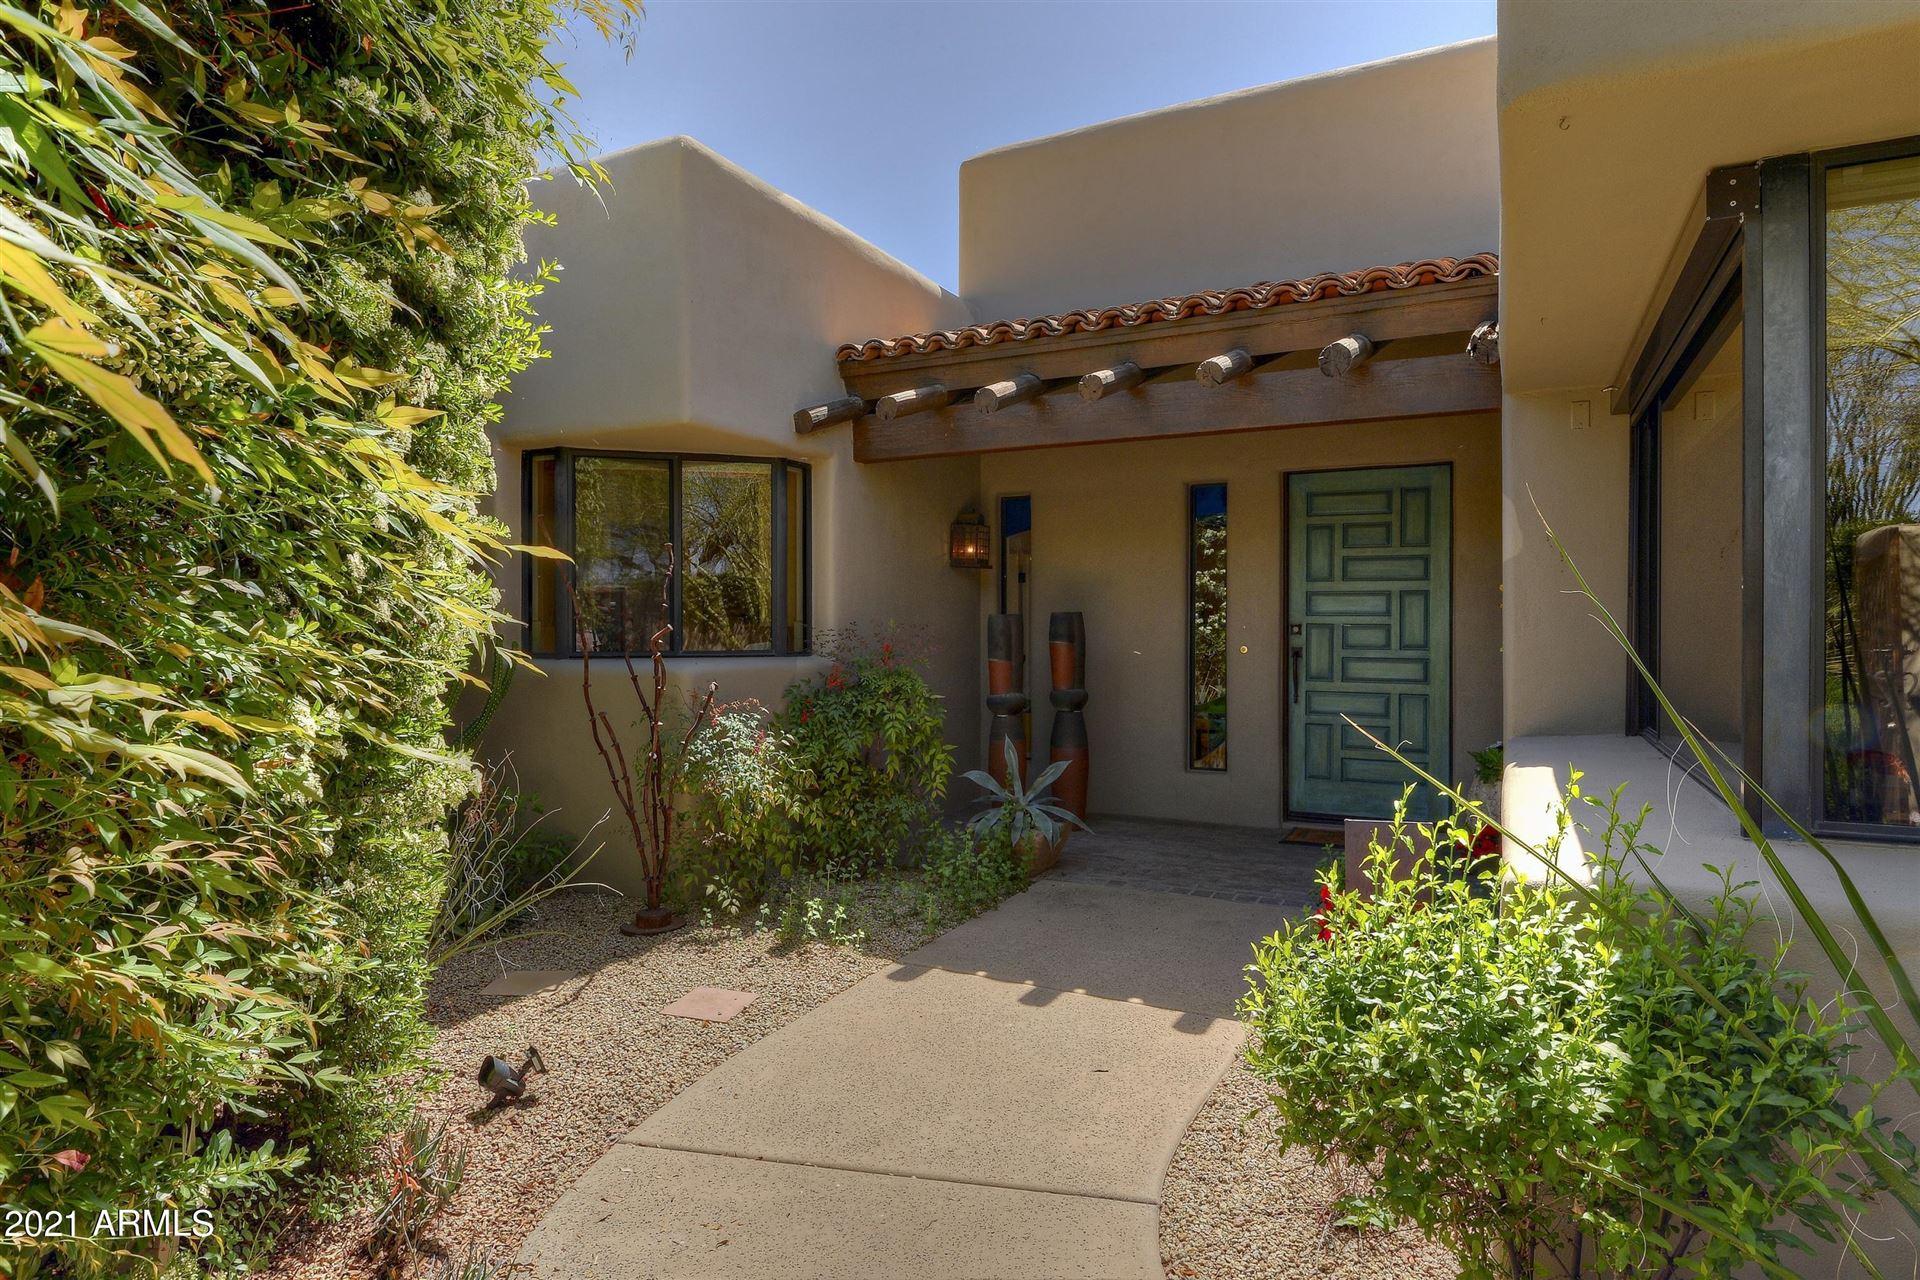 Photo of 3207 E ARROYO SECO Road, Carefree, AZ 85377 (MLS # 6218476)